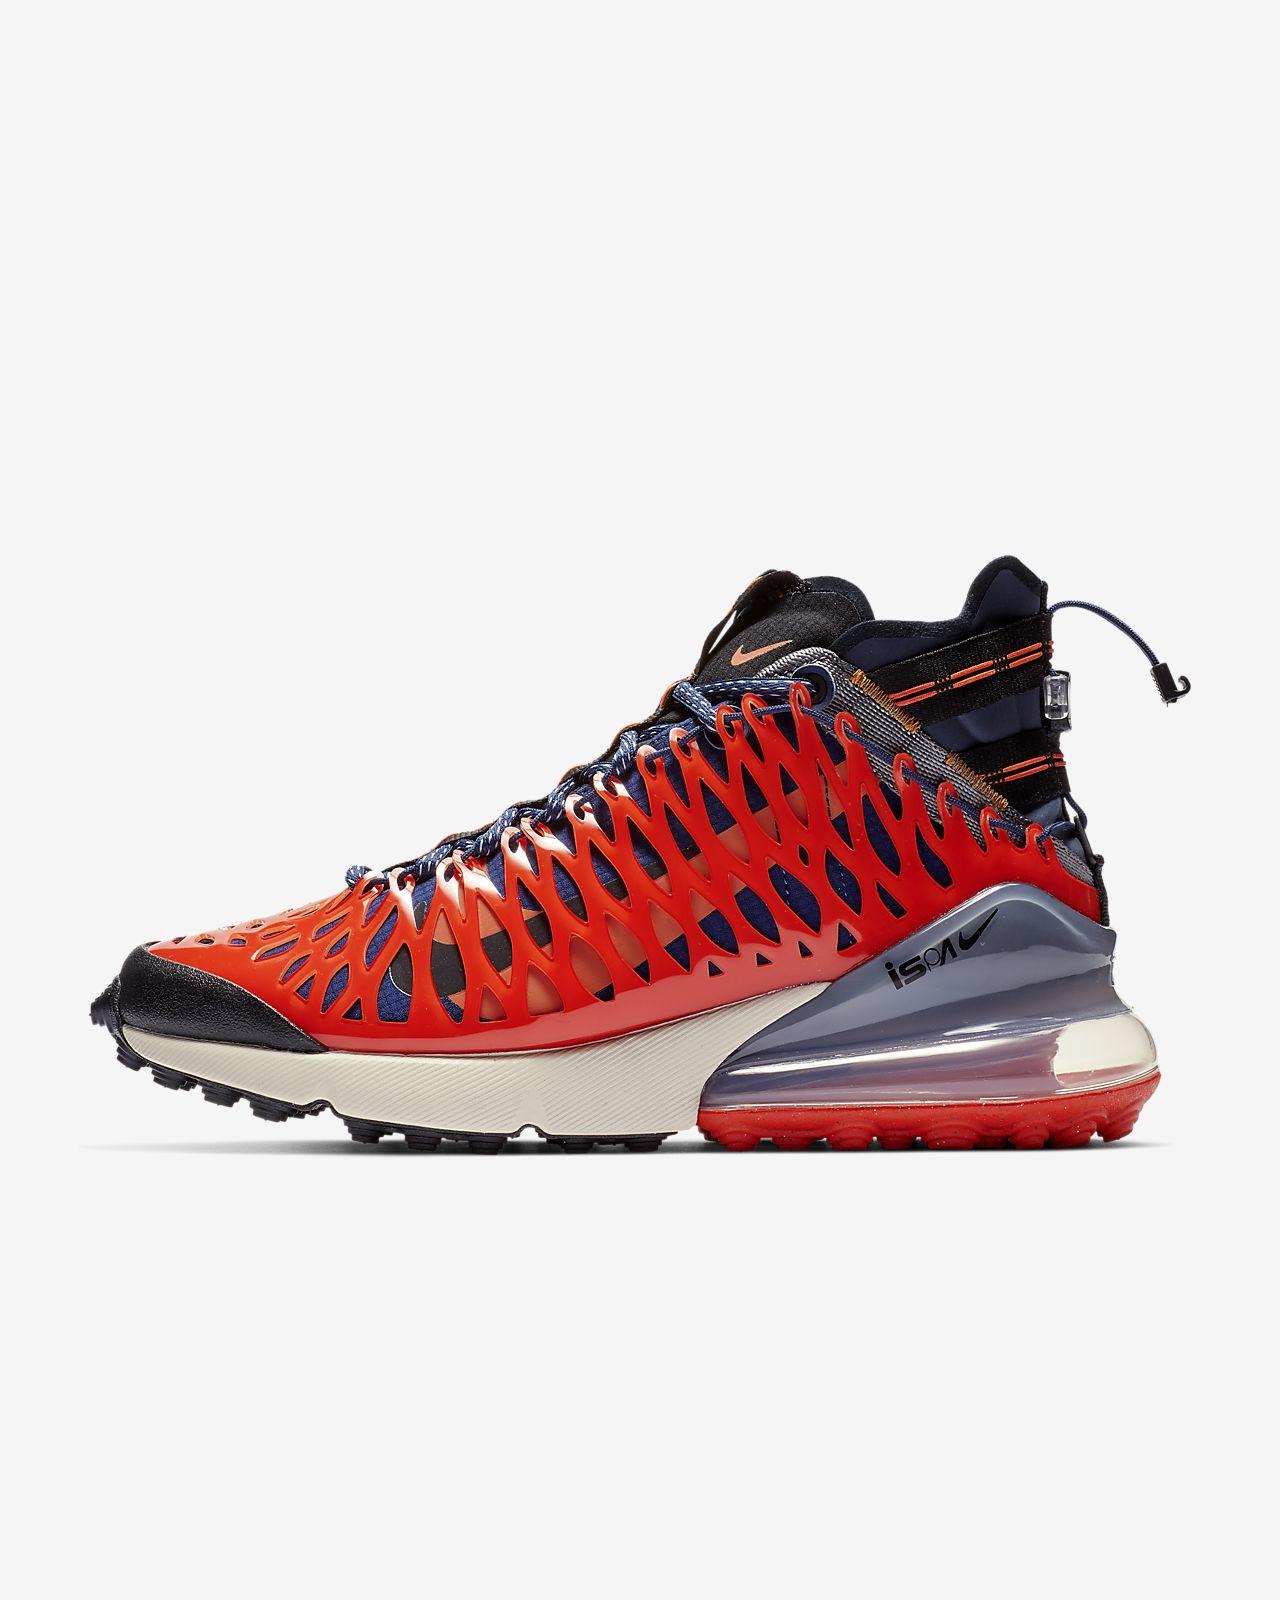 c8654fe9e5a24 Nike Air Max 270 ISPA Men's Shoe. Nike.com SE